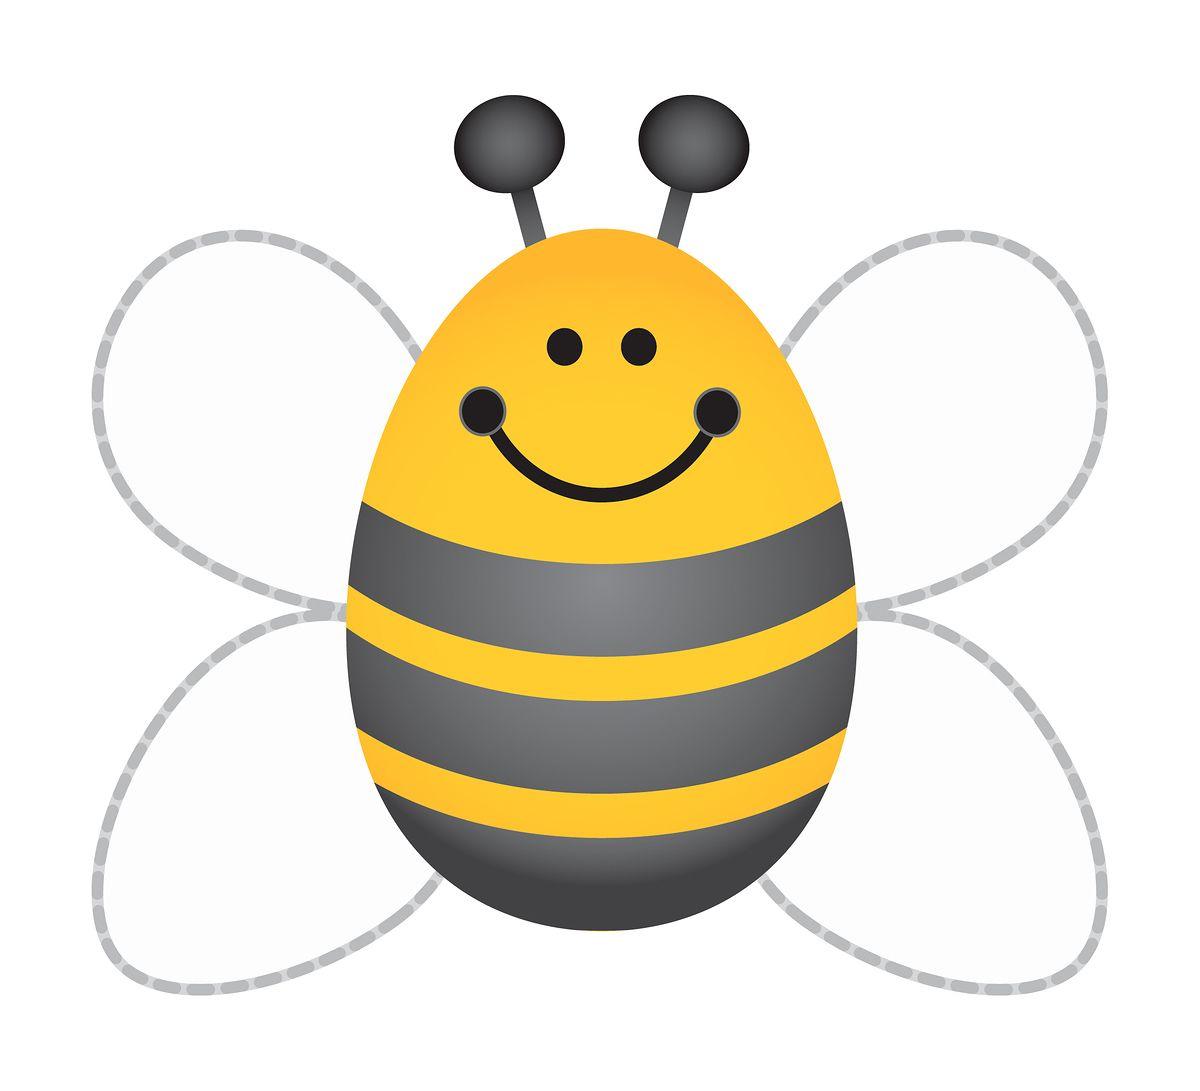 Bumblebee template best insect. Bees clipart preschool